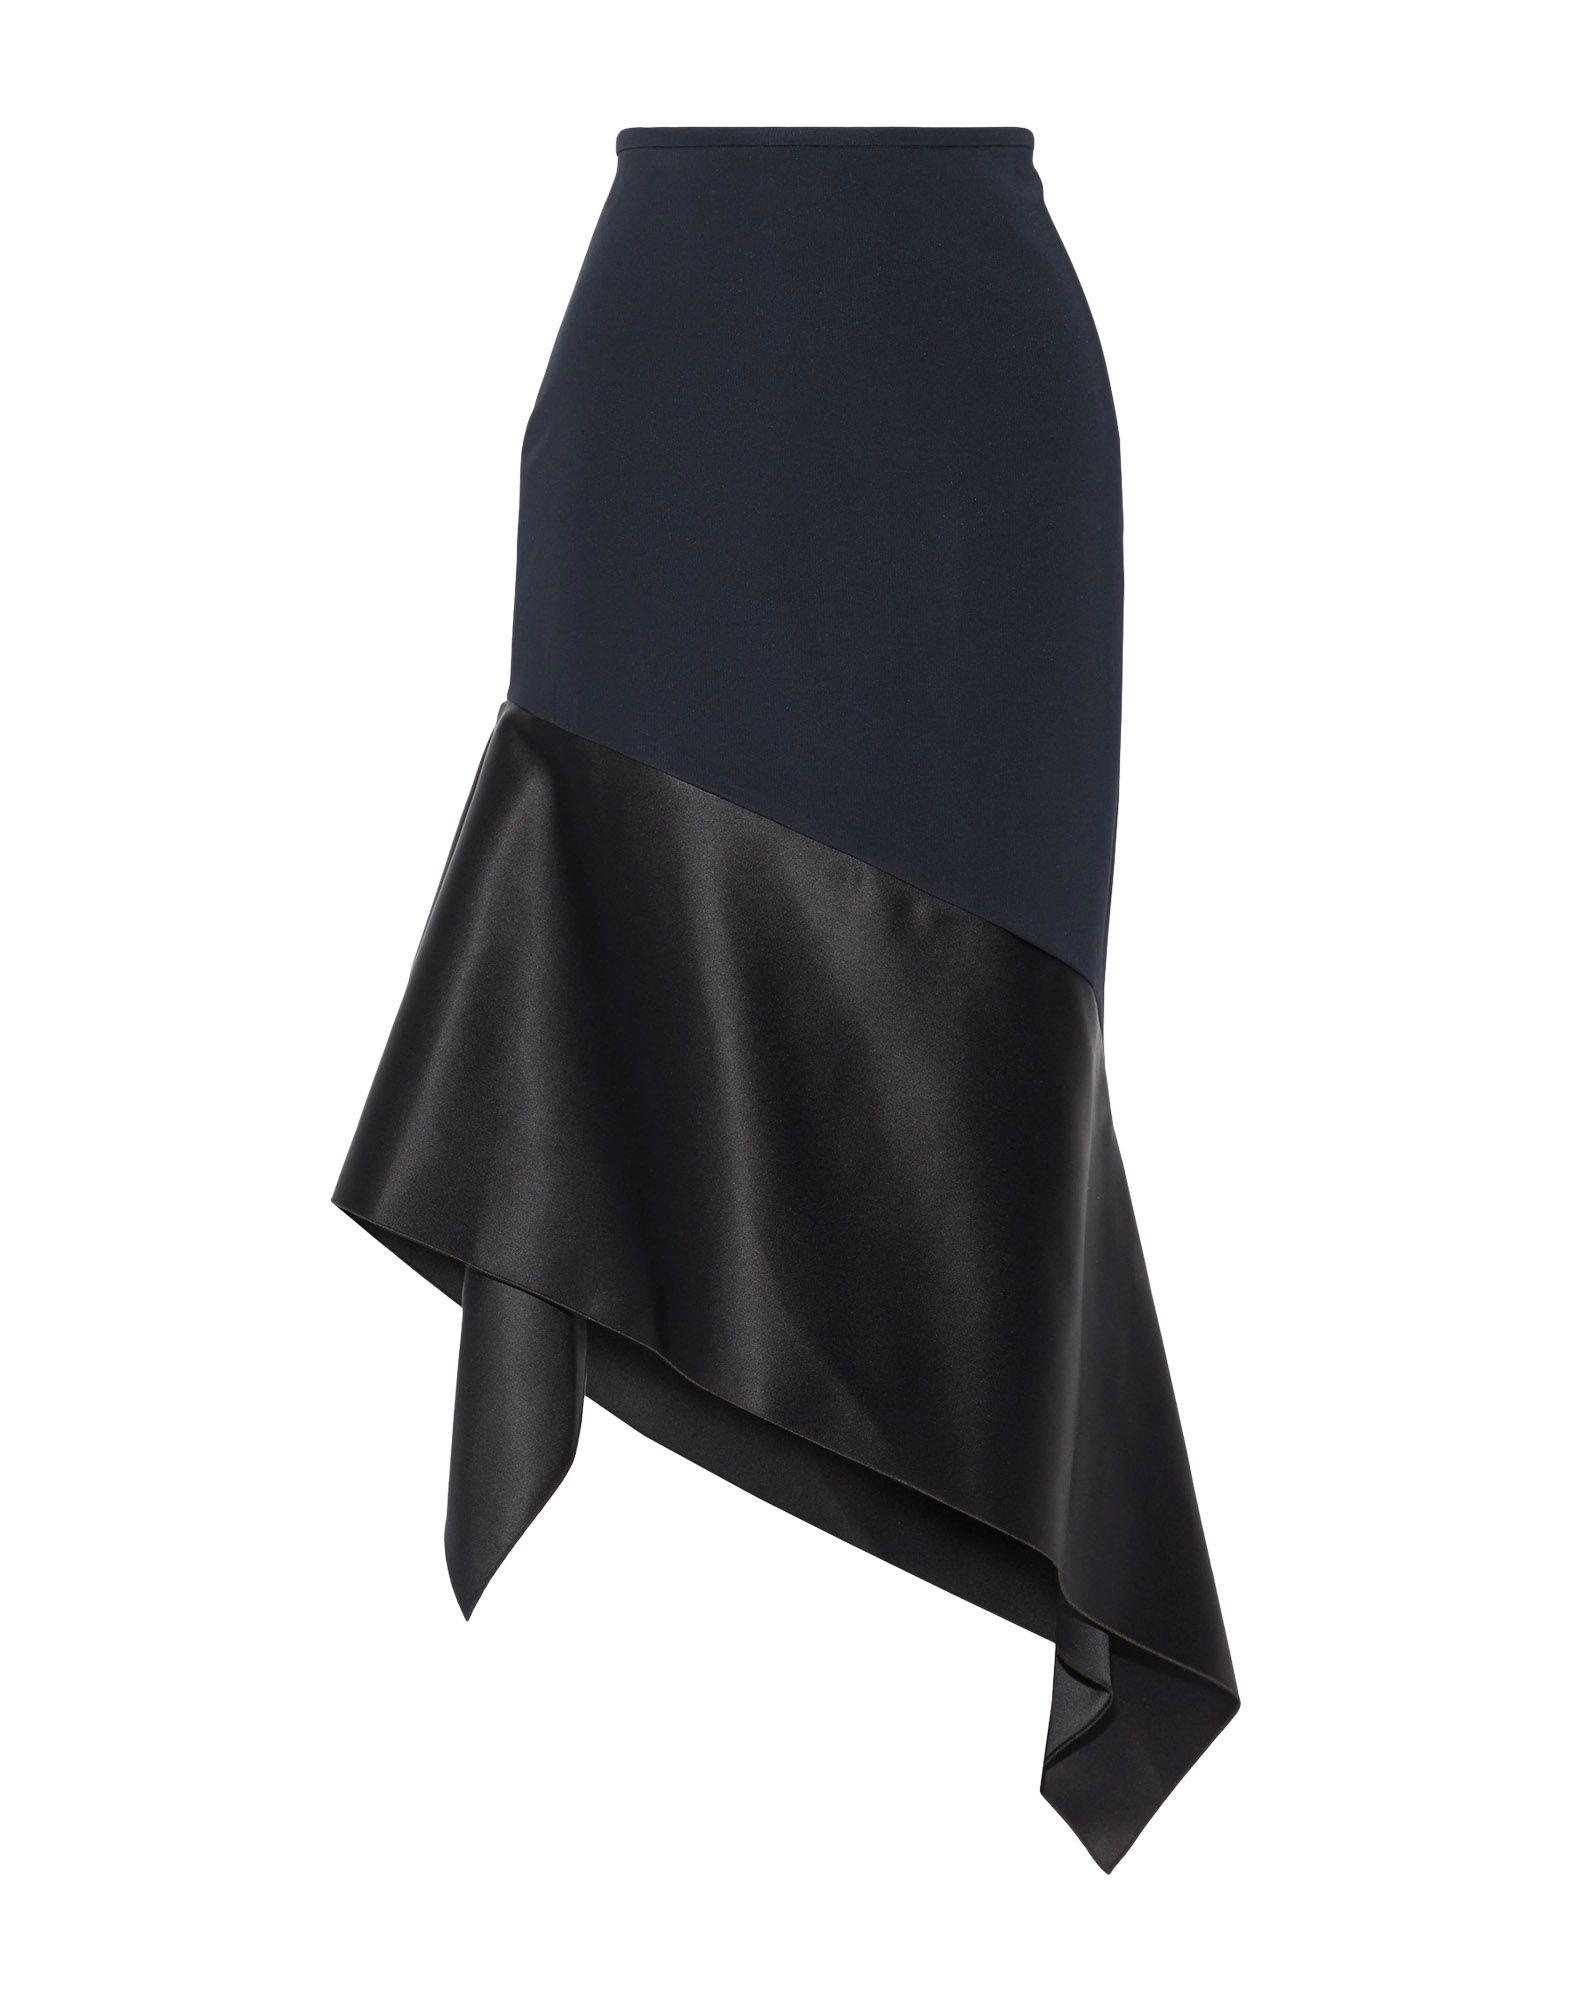 60abbed7fb Dion Lee Knee Length Skirt - Women Dion Lee Knee Length Skirts ...